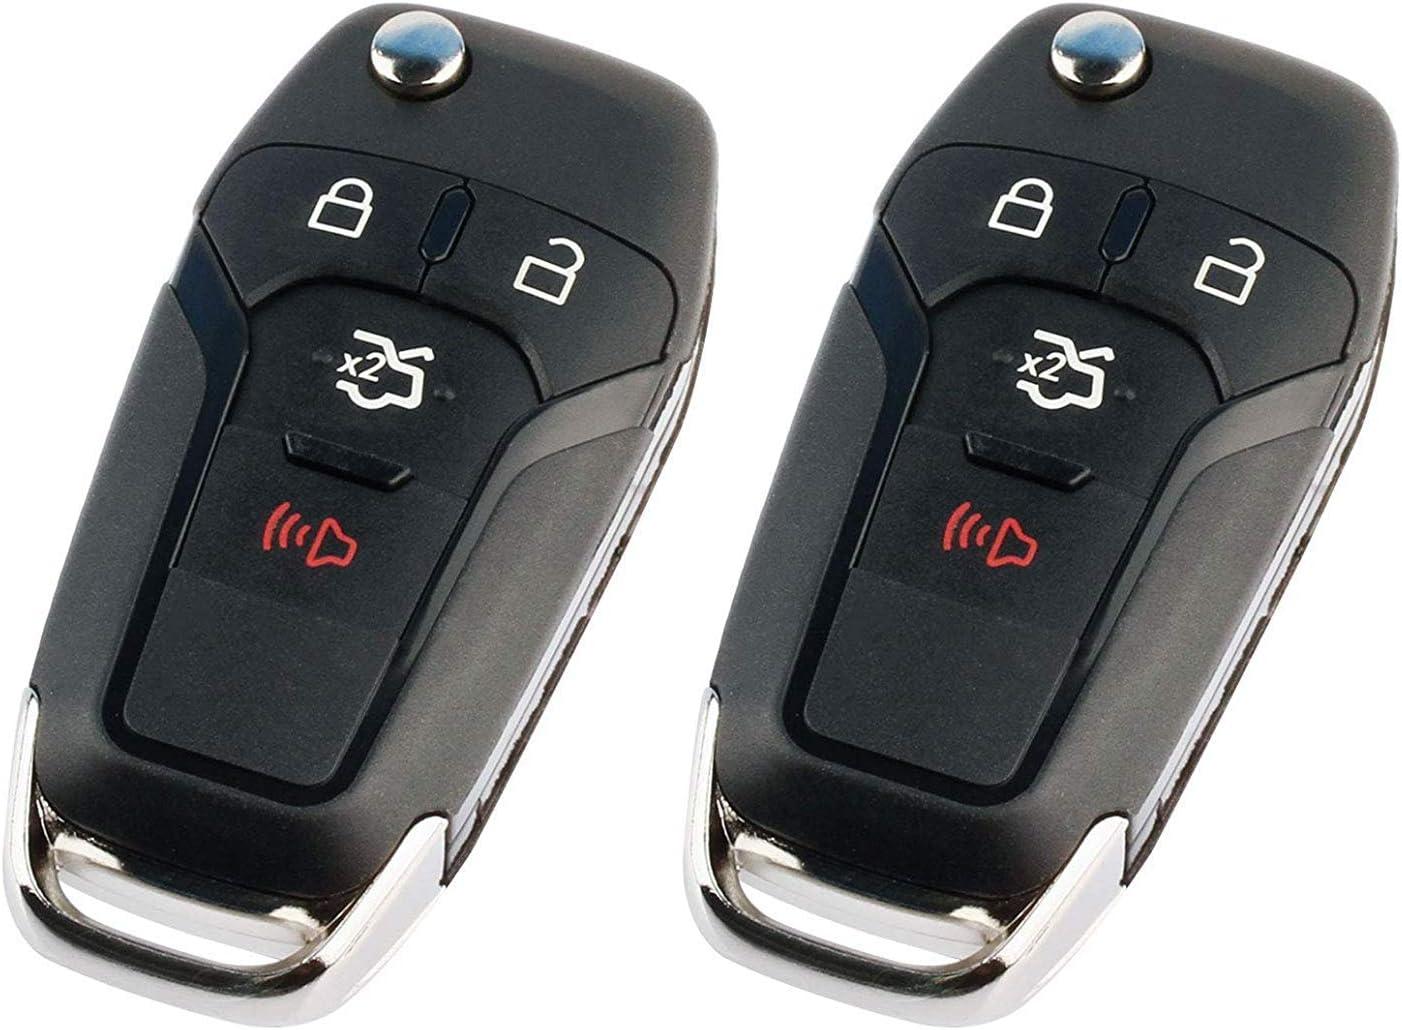 Flip Key for 2013-2020 Ford F-150 Explorer Keyless Entry Remote Fob N5F-A08TAA 5923667